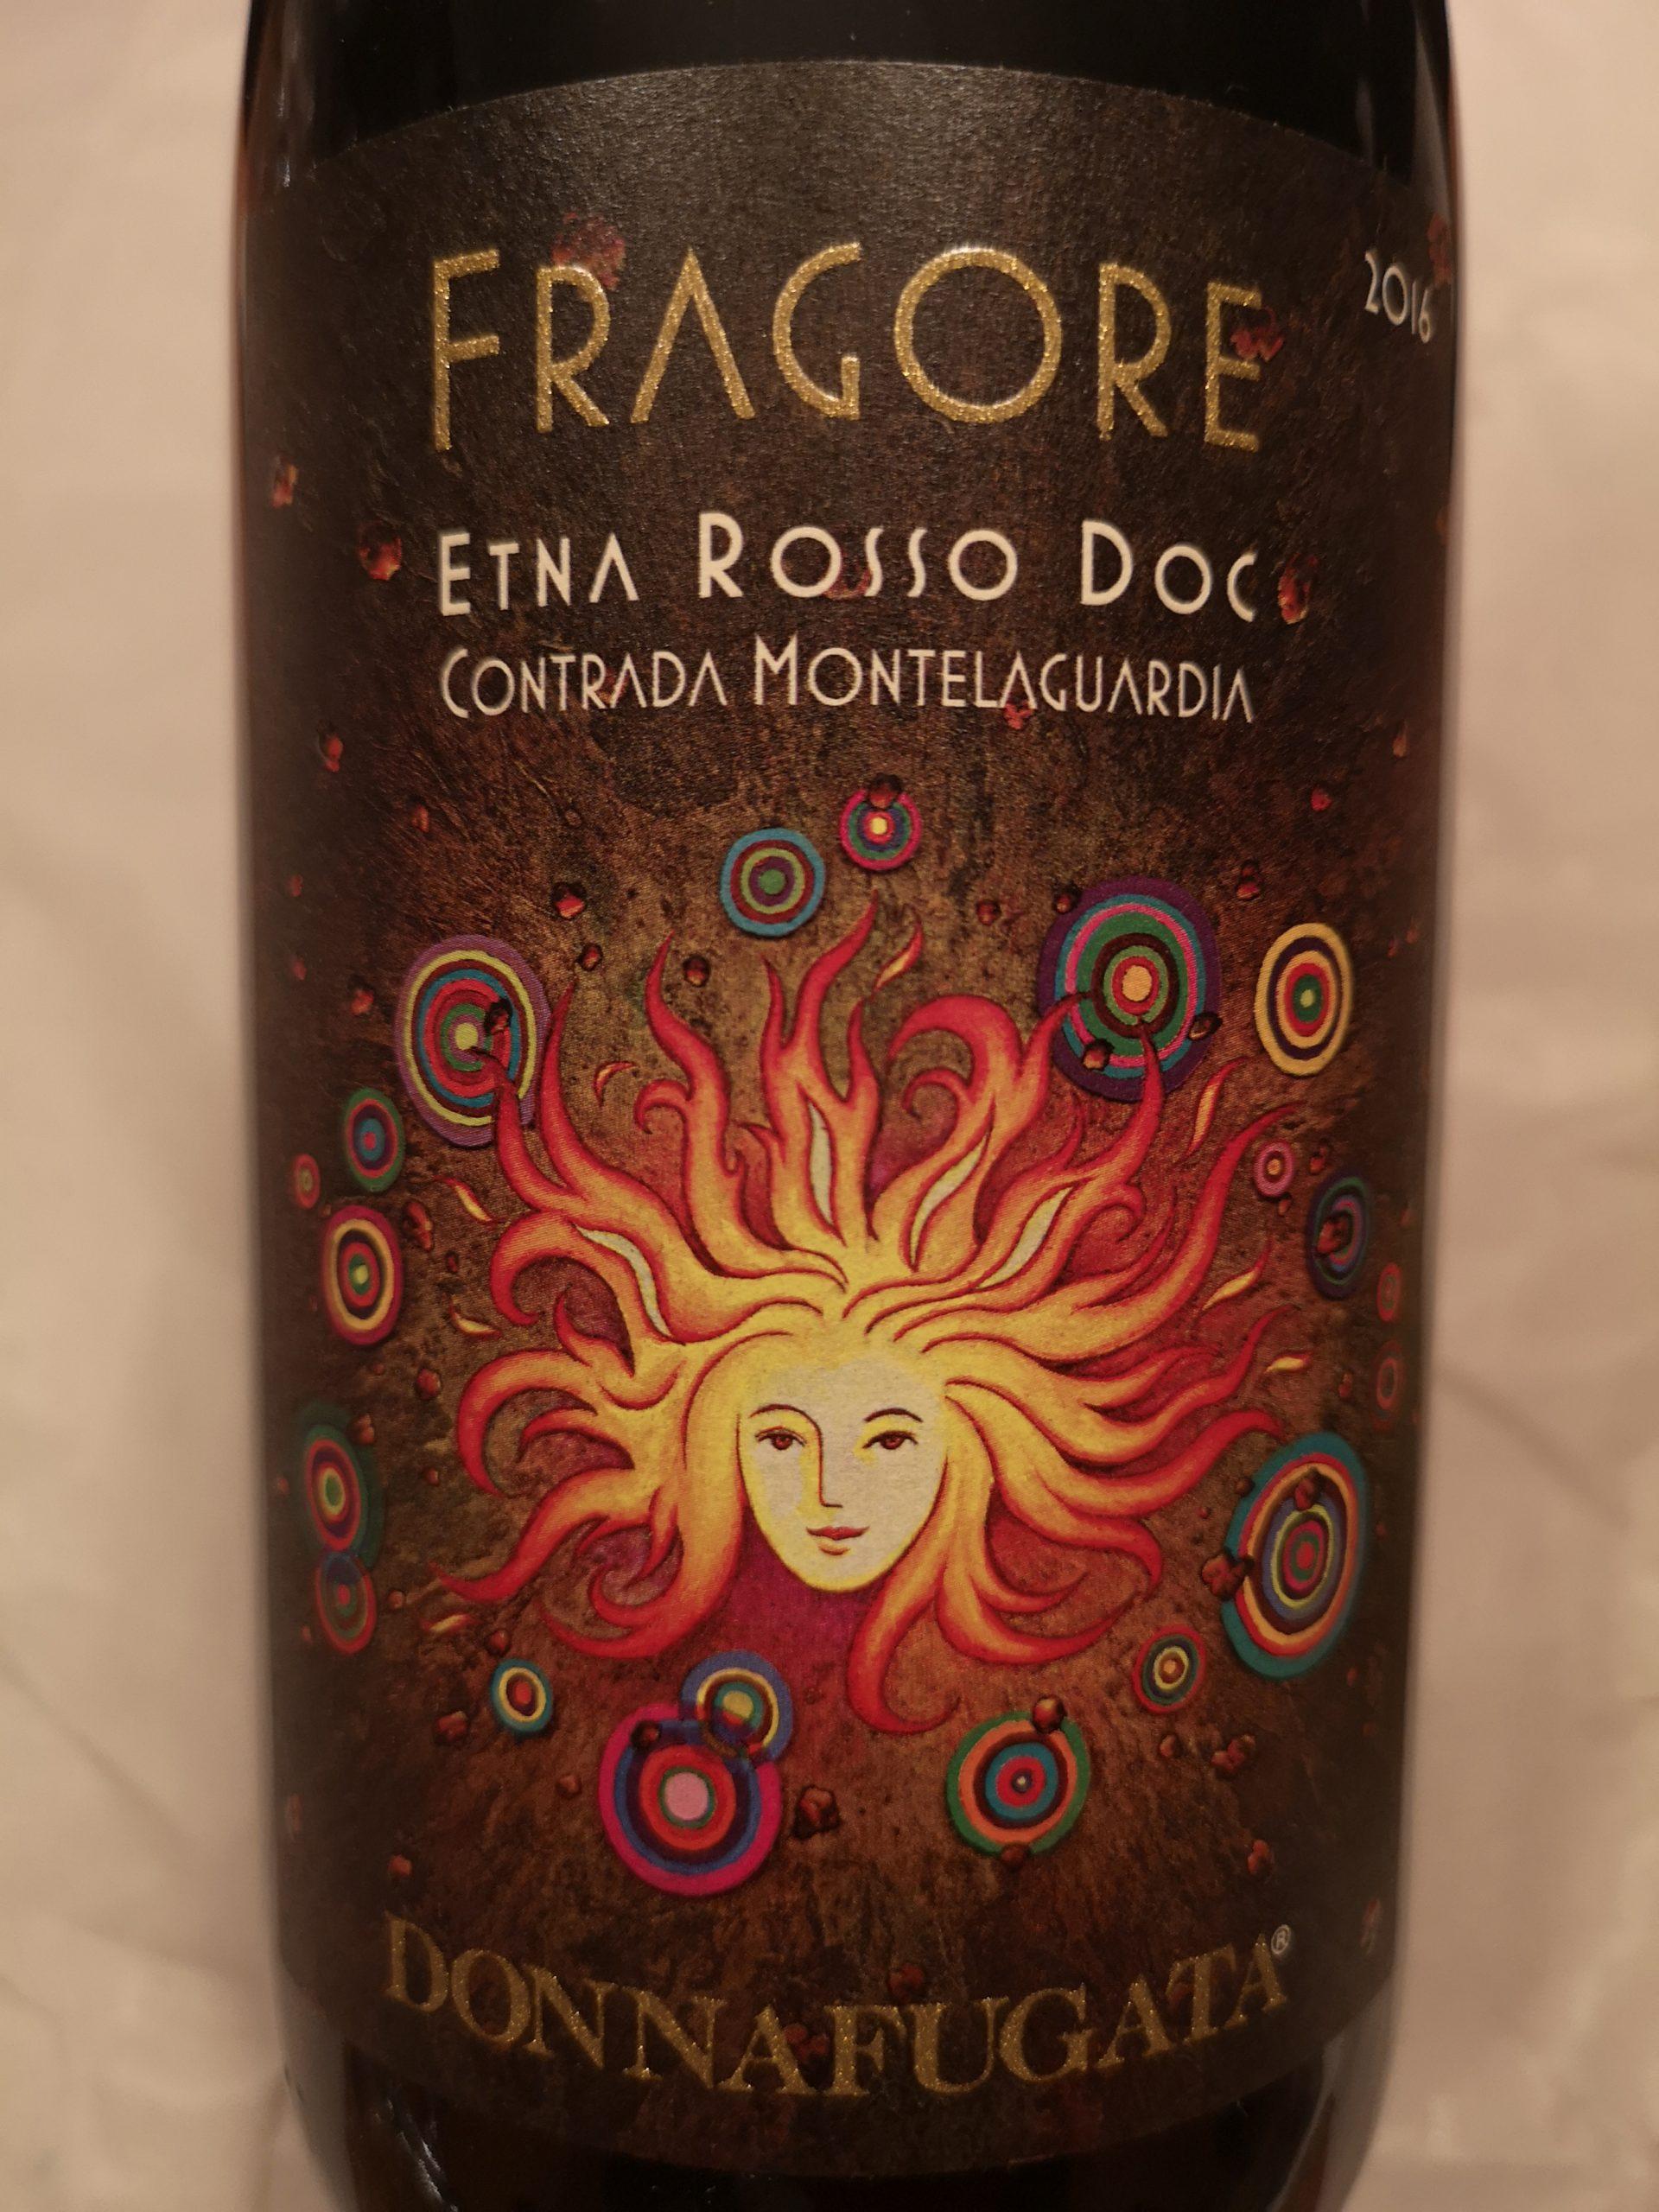 2016 Fragore Etna Rosso | Donnafugata